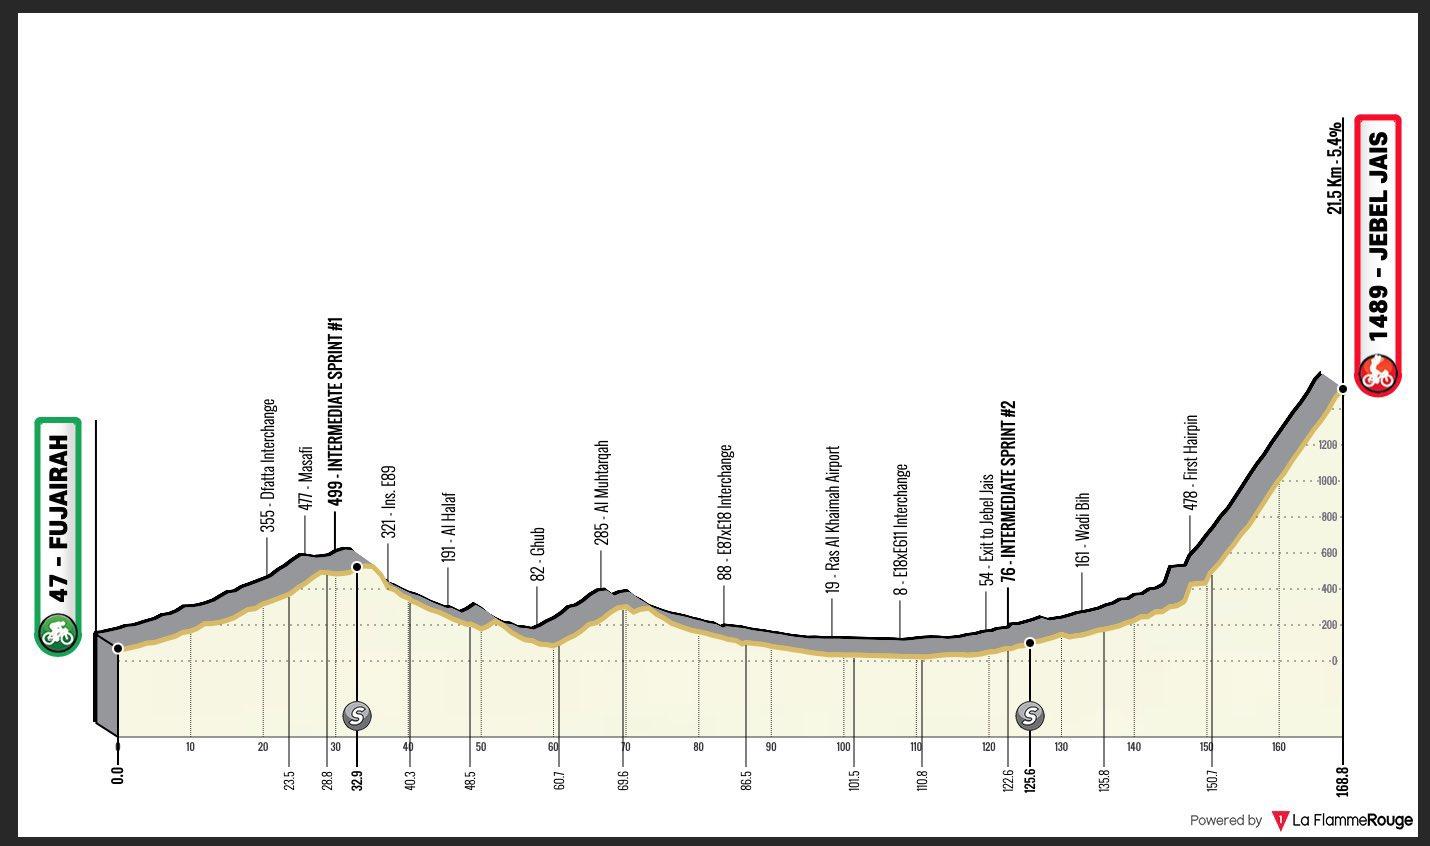 5. etapa UAE Tour 2021